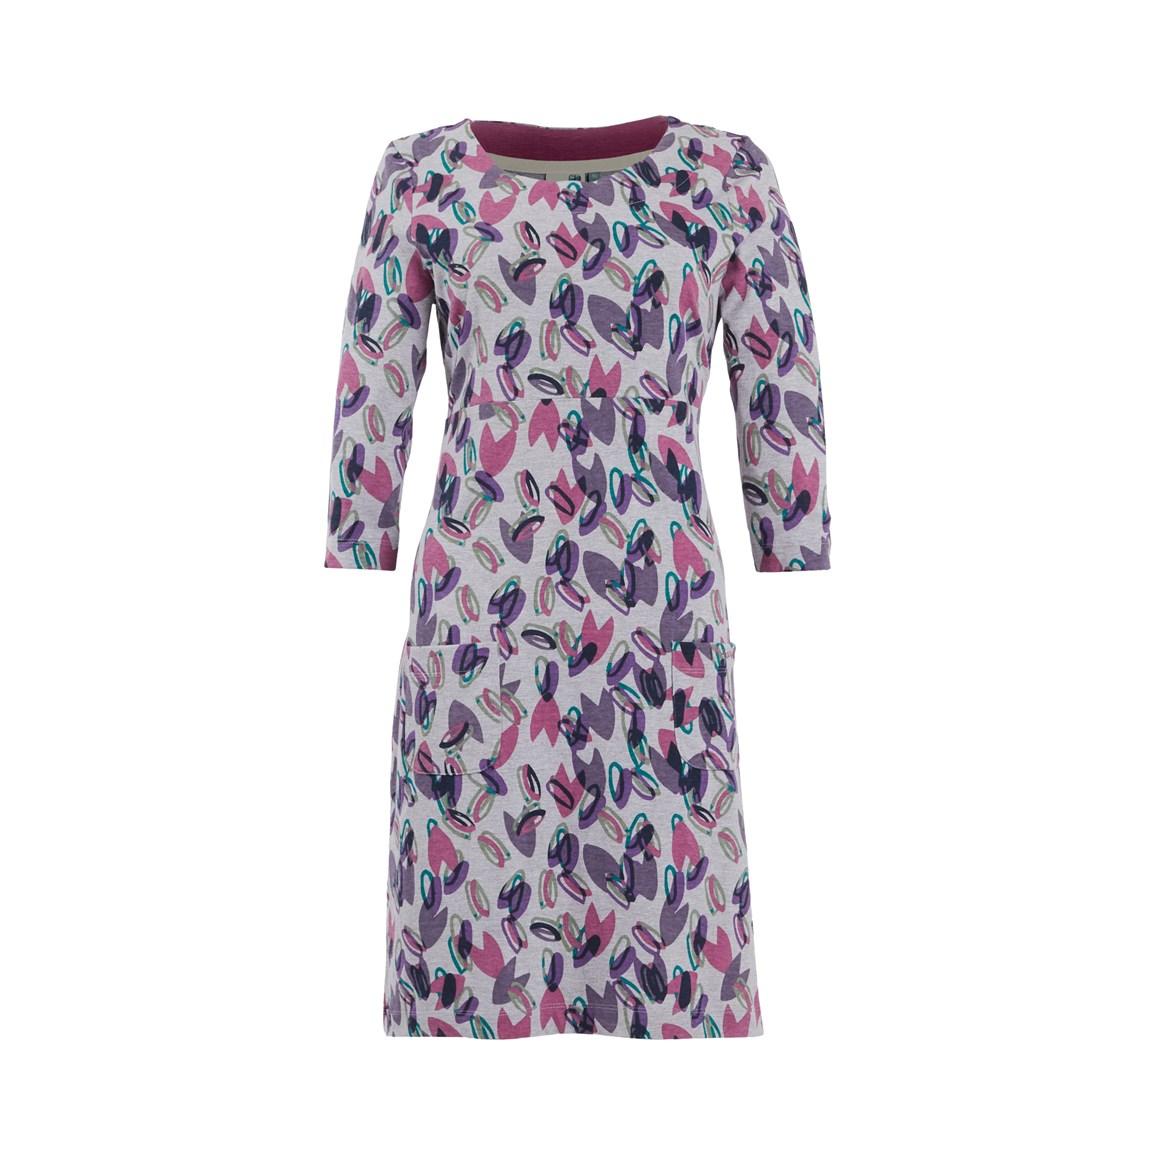 Women's Dresses & Skirts Weird Fish Starshine Patterned Jersey Dress Grey Marl Size 12